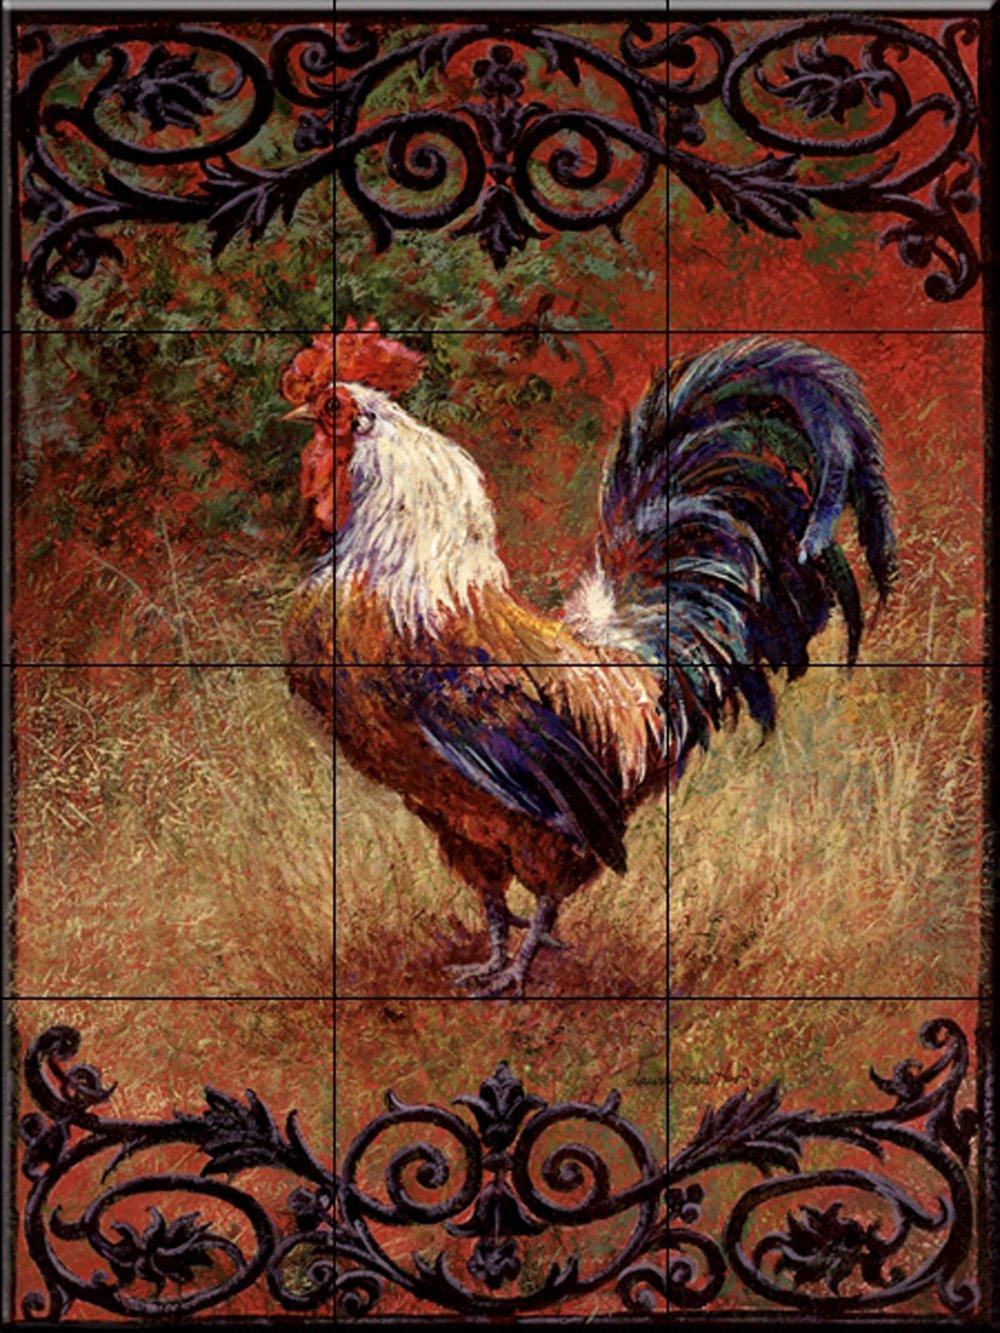 Ceramic Tile Mural - Iron Gate Rooster I - by Laurie Snow Hein - Kitchen backsplash/Bathroom Shower